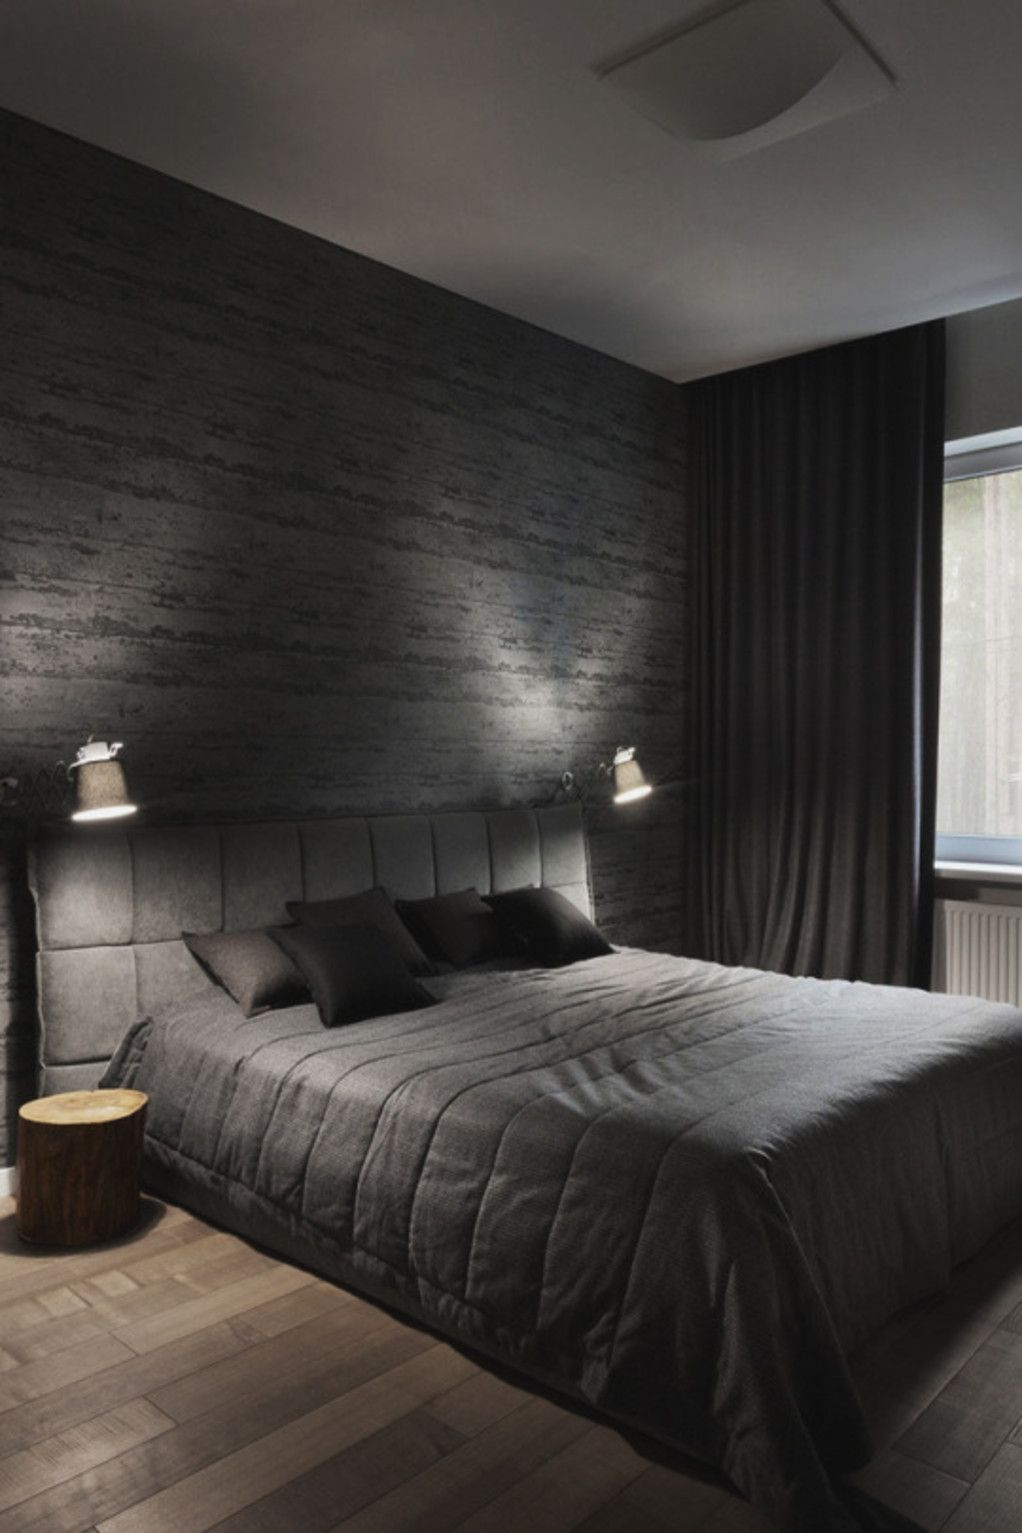 Minimal Interior Design Inspiration 8 Black Bedroom Decor Luxurious Bedrooms Modern Bedroom